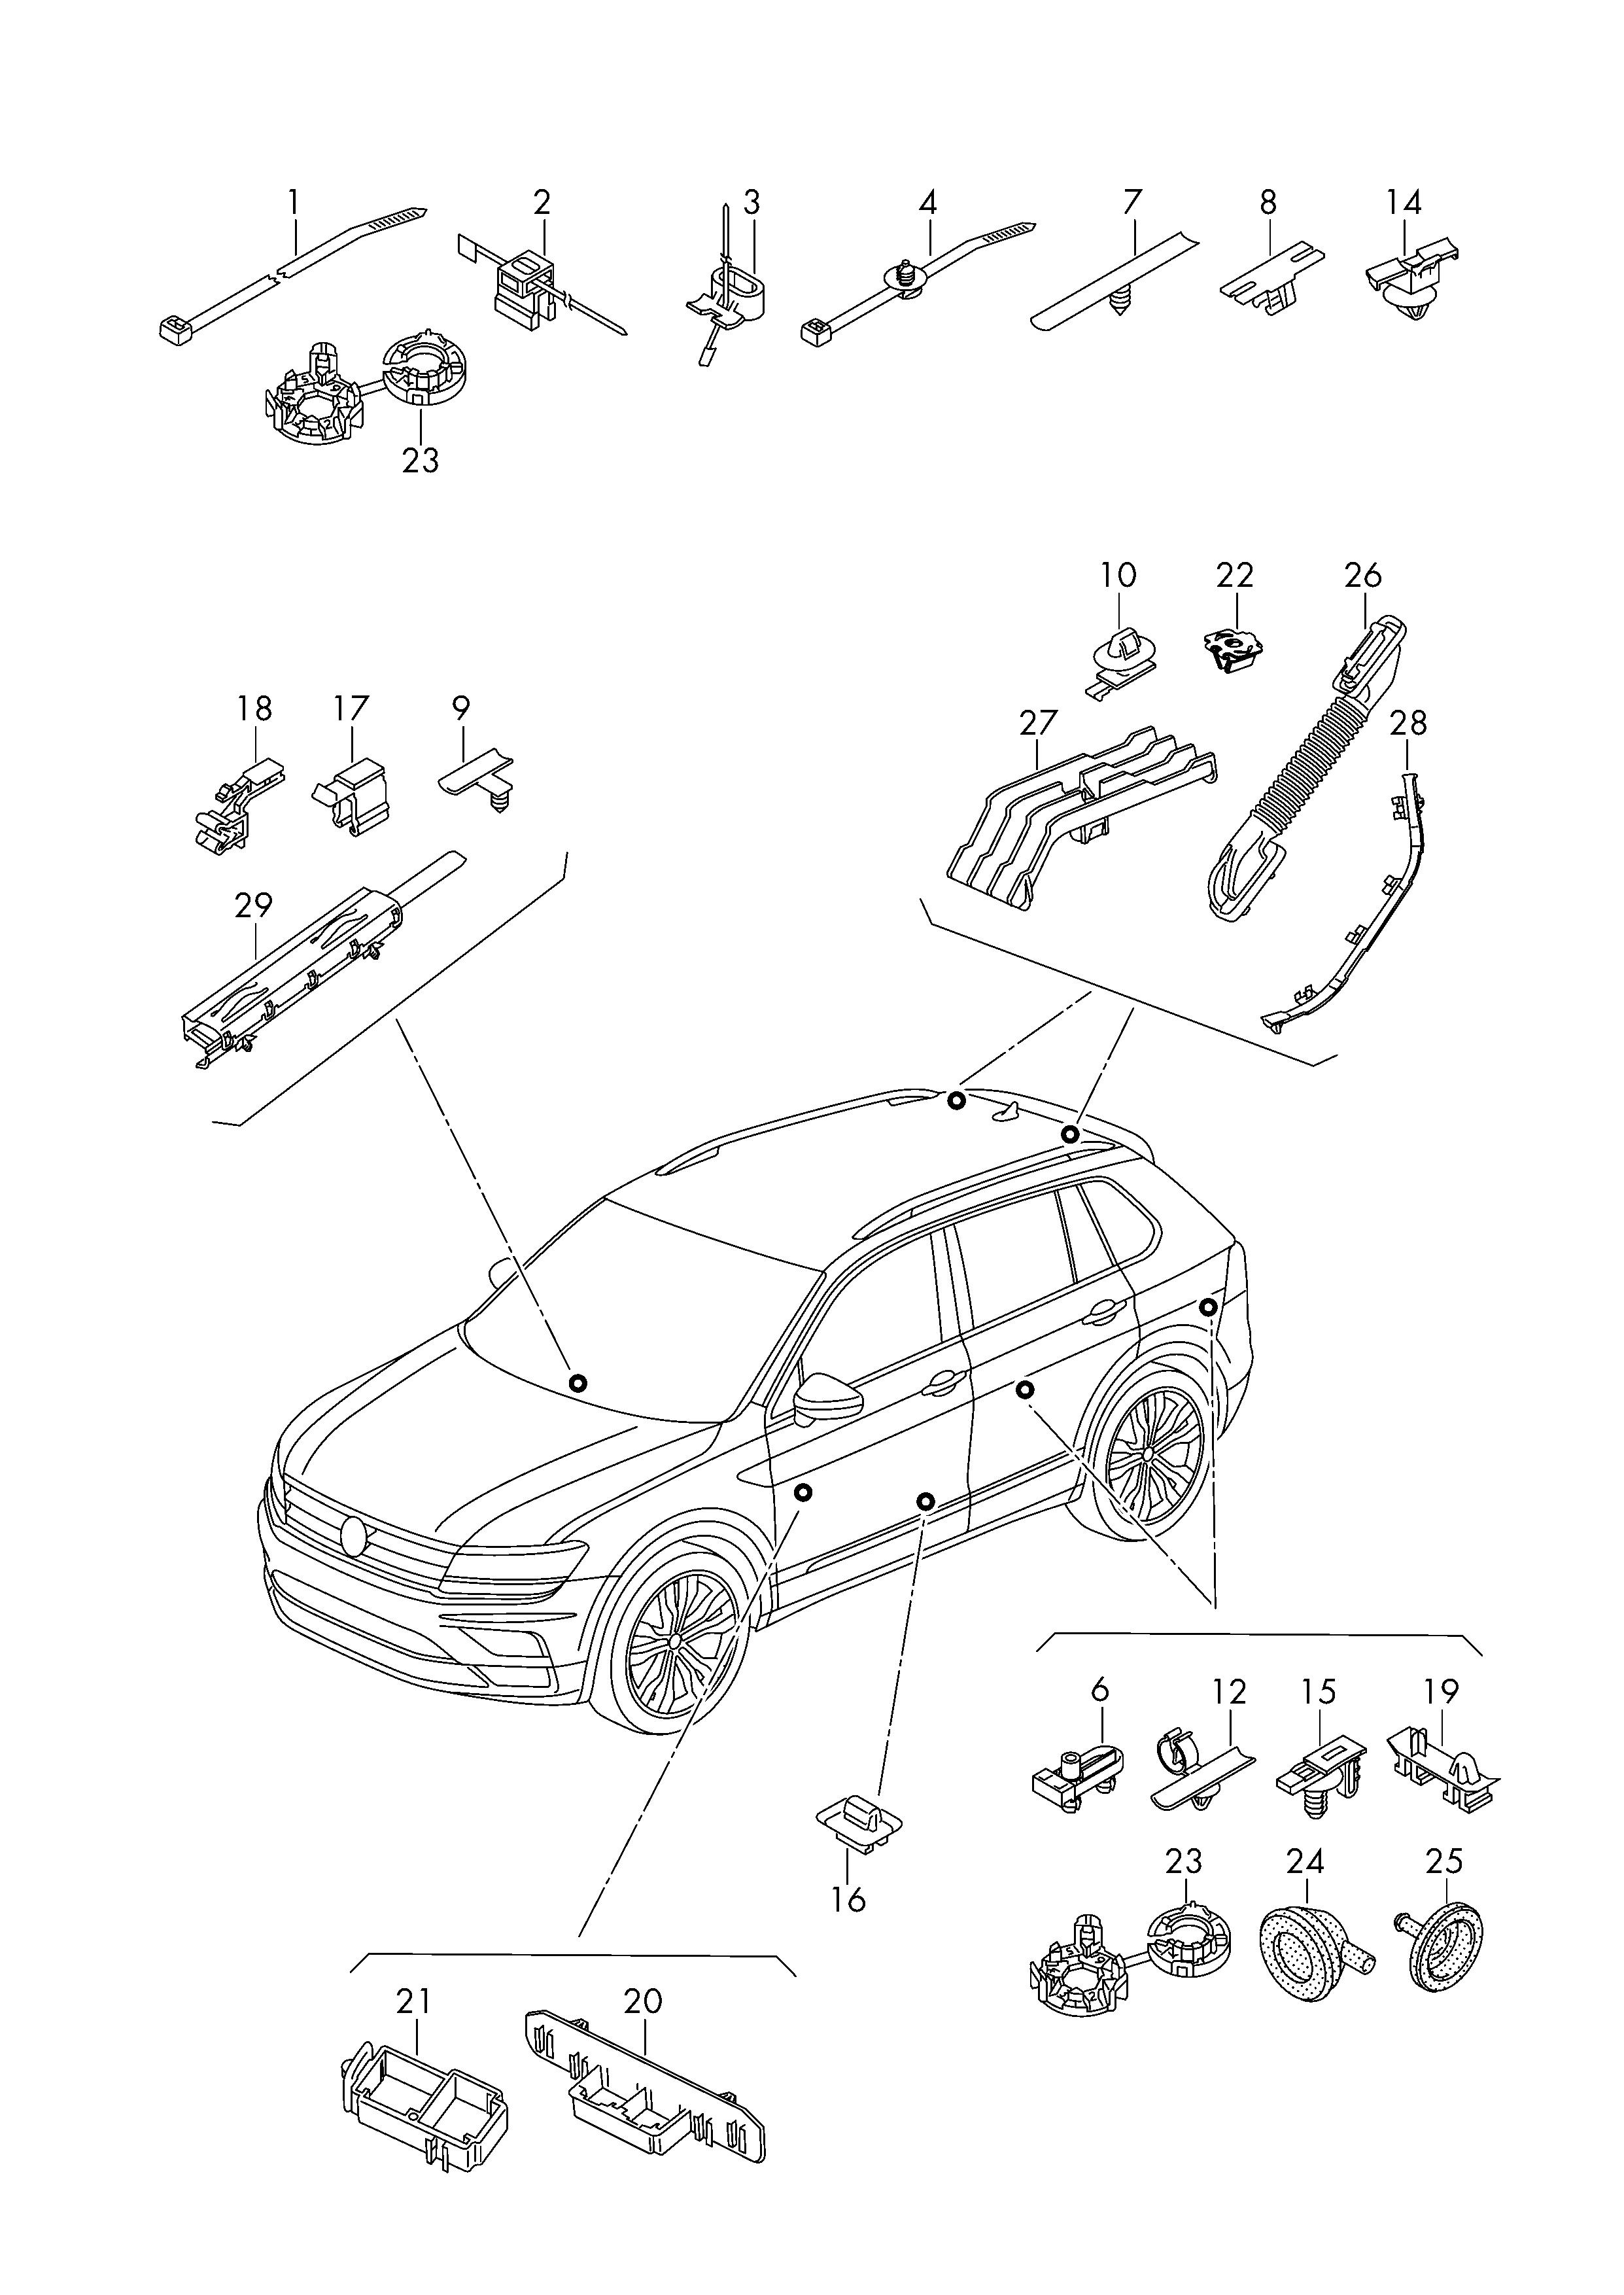 Volkswagen Tiguan 2016 2017 Cable Ties Bracket Clip Wiring Automotive Harness Design Guide Vag Etka